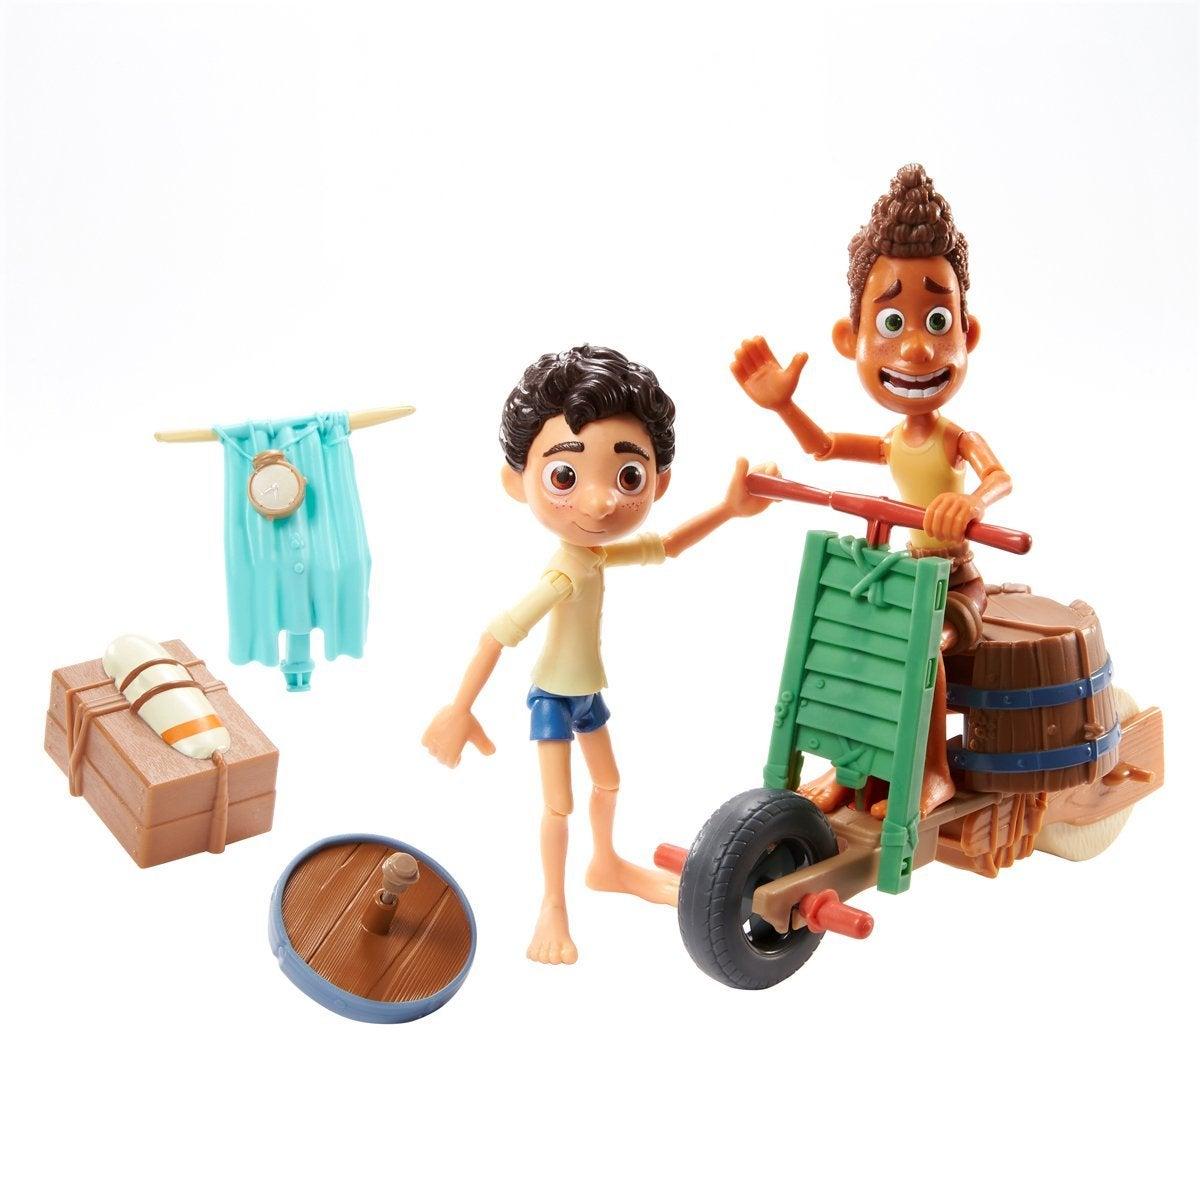 Disney Pixar Luca Scooter Build & Crash Pack (GXK62)